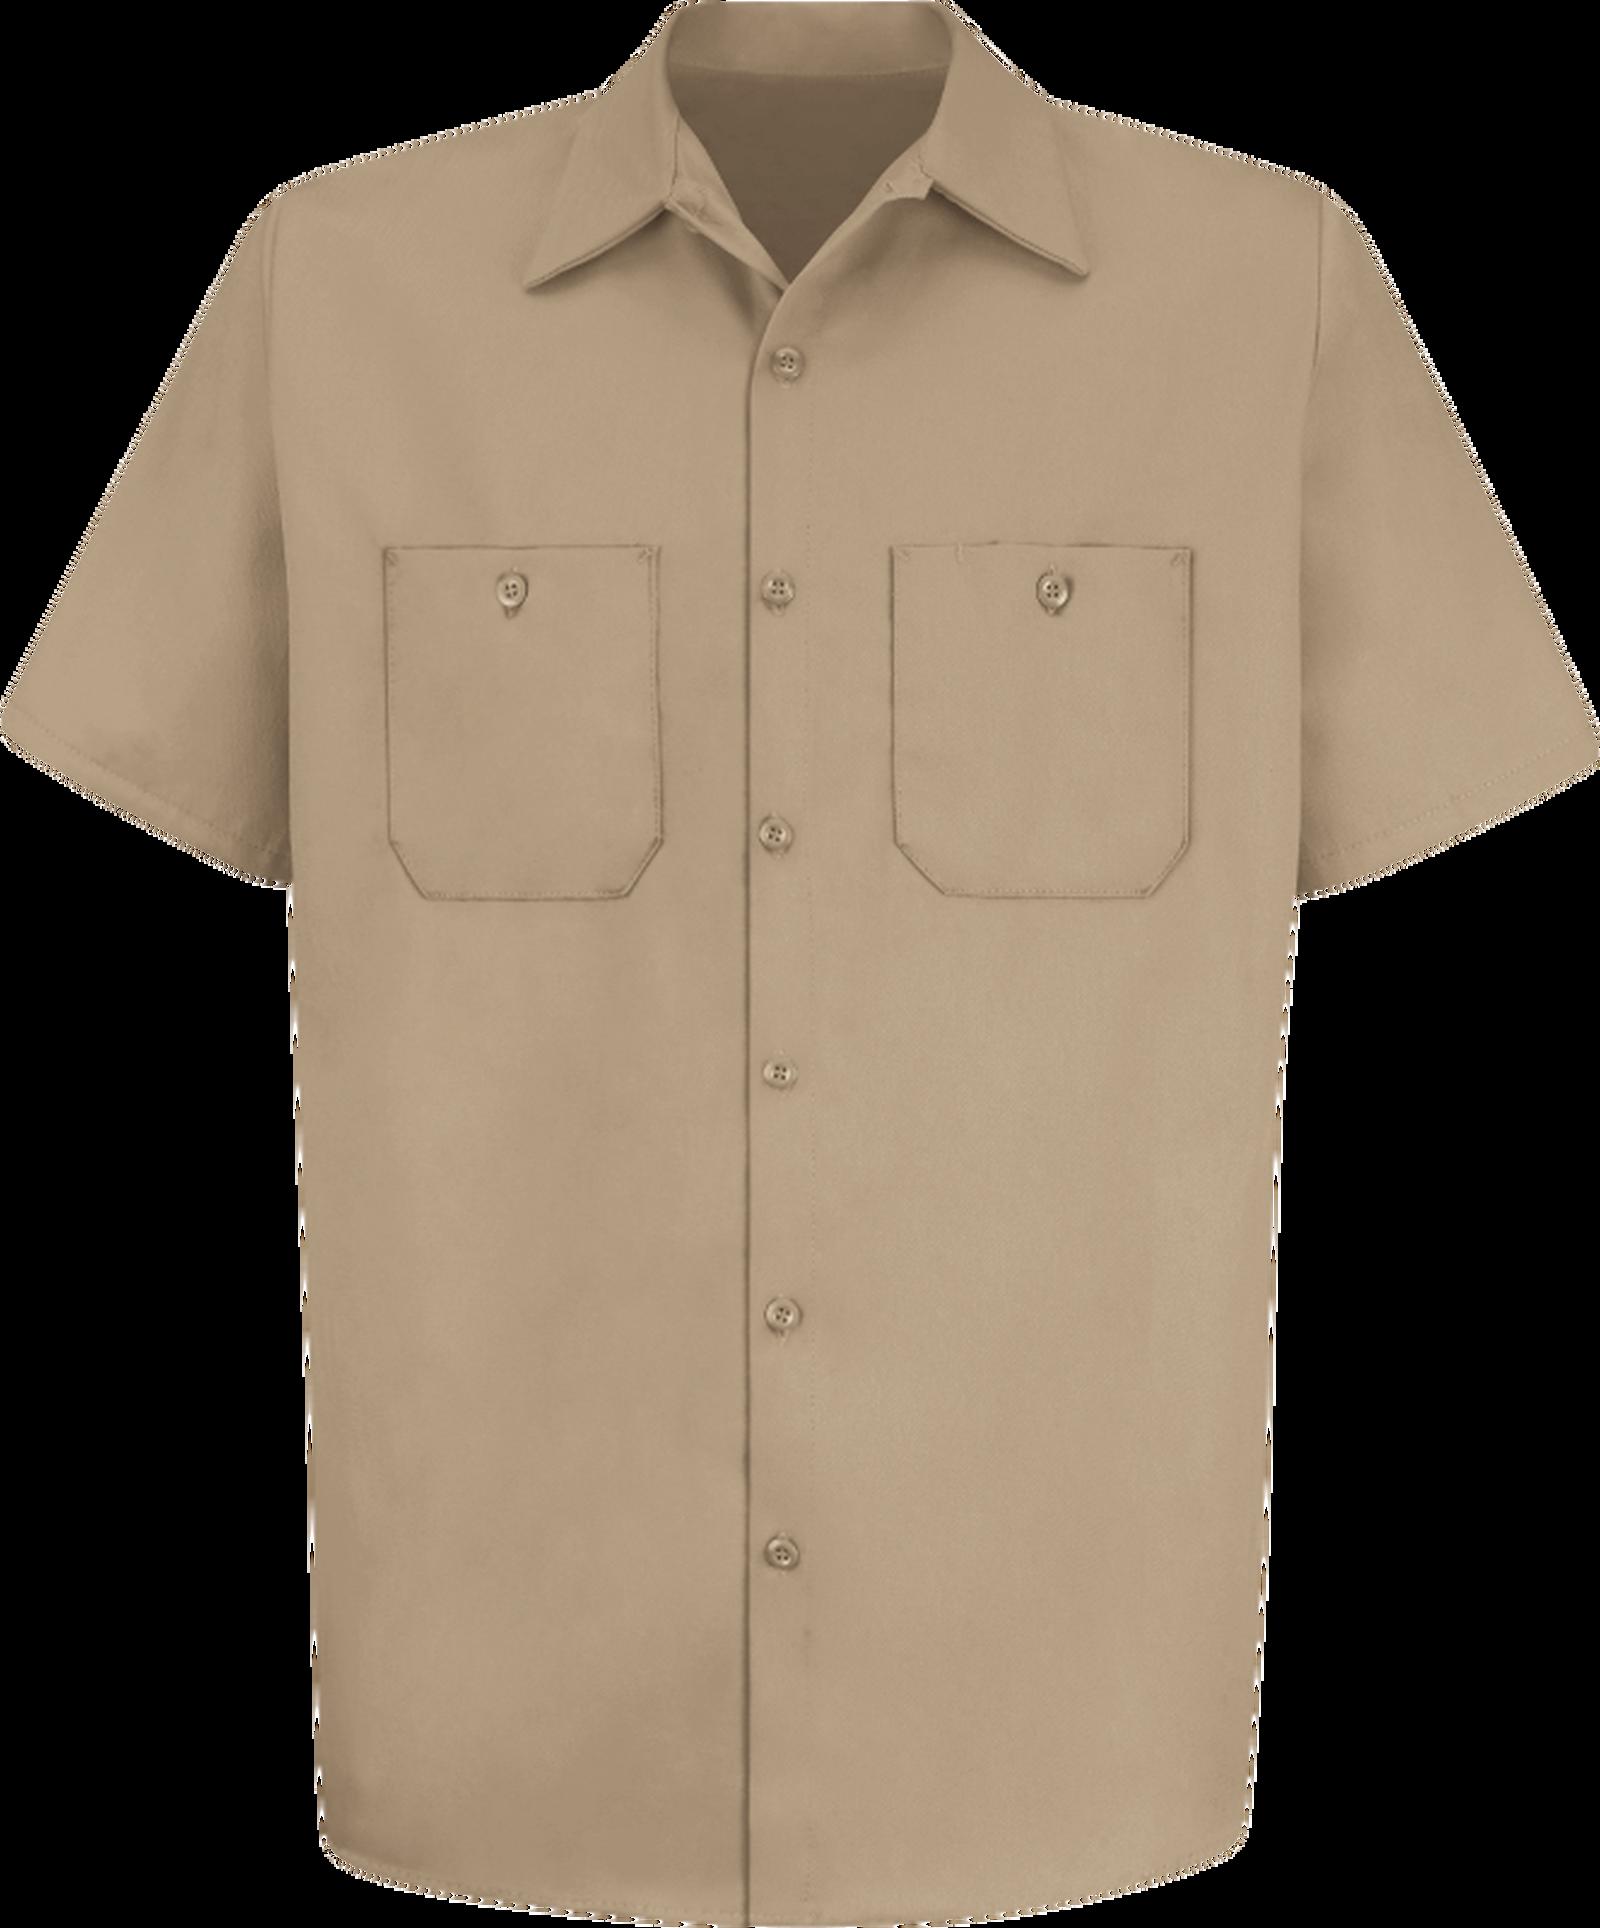 Men's Short Sleeve Wrinkle-Resistant Cotton WorkShirt